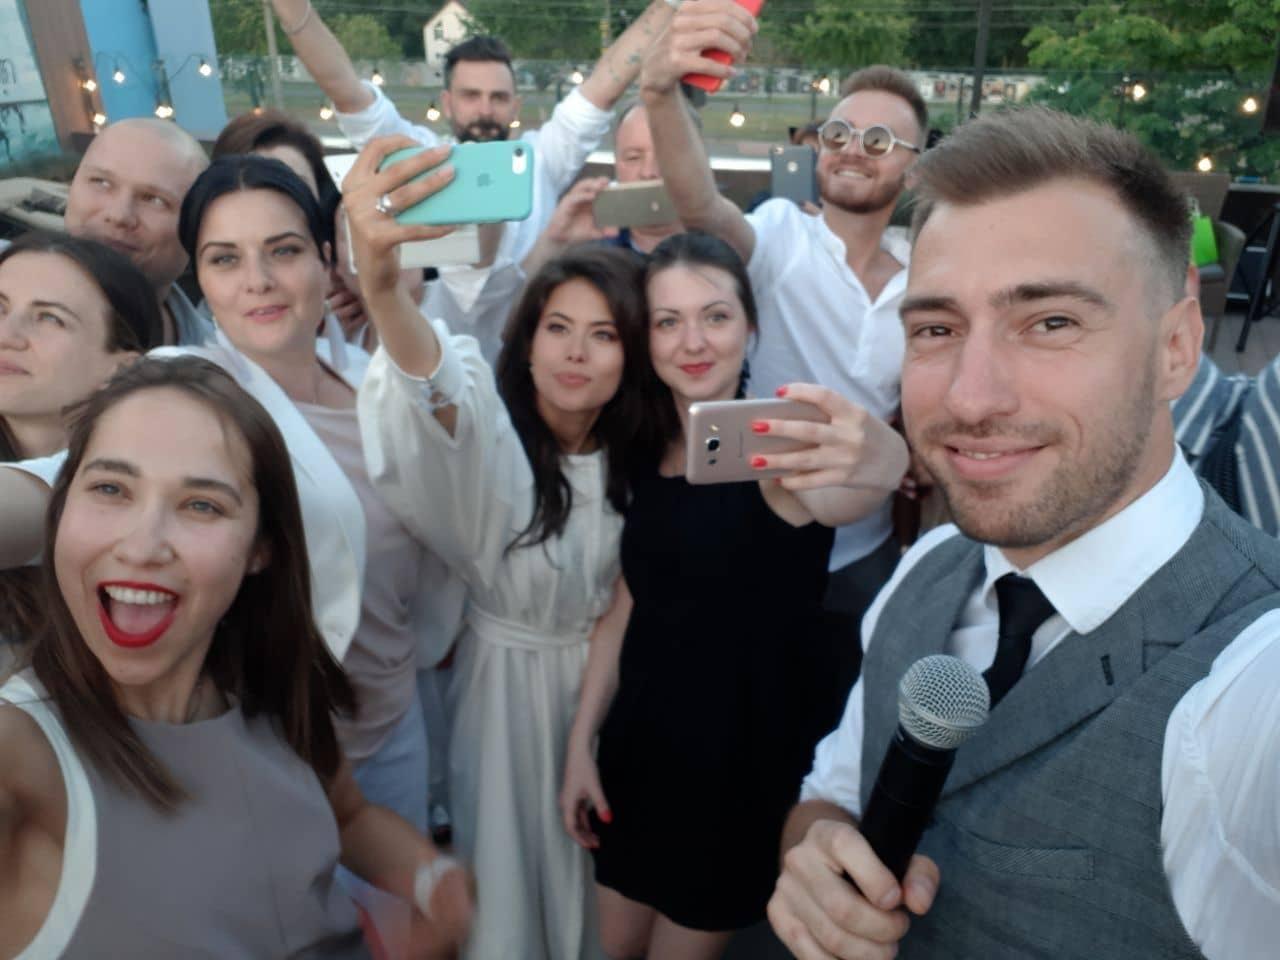 aktery-serialiti-kiev-dnem-i-nochyu-sygrali-avralnuyu-svadbu_2